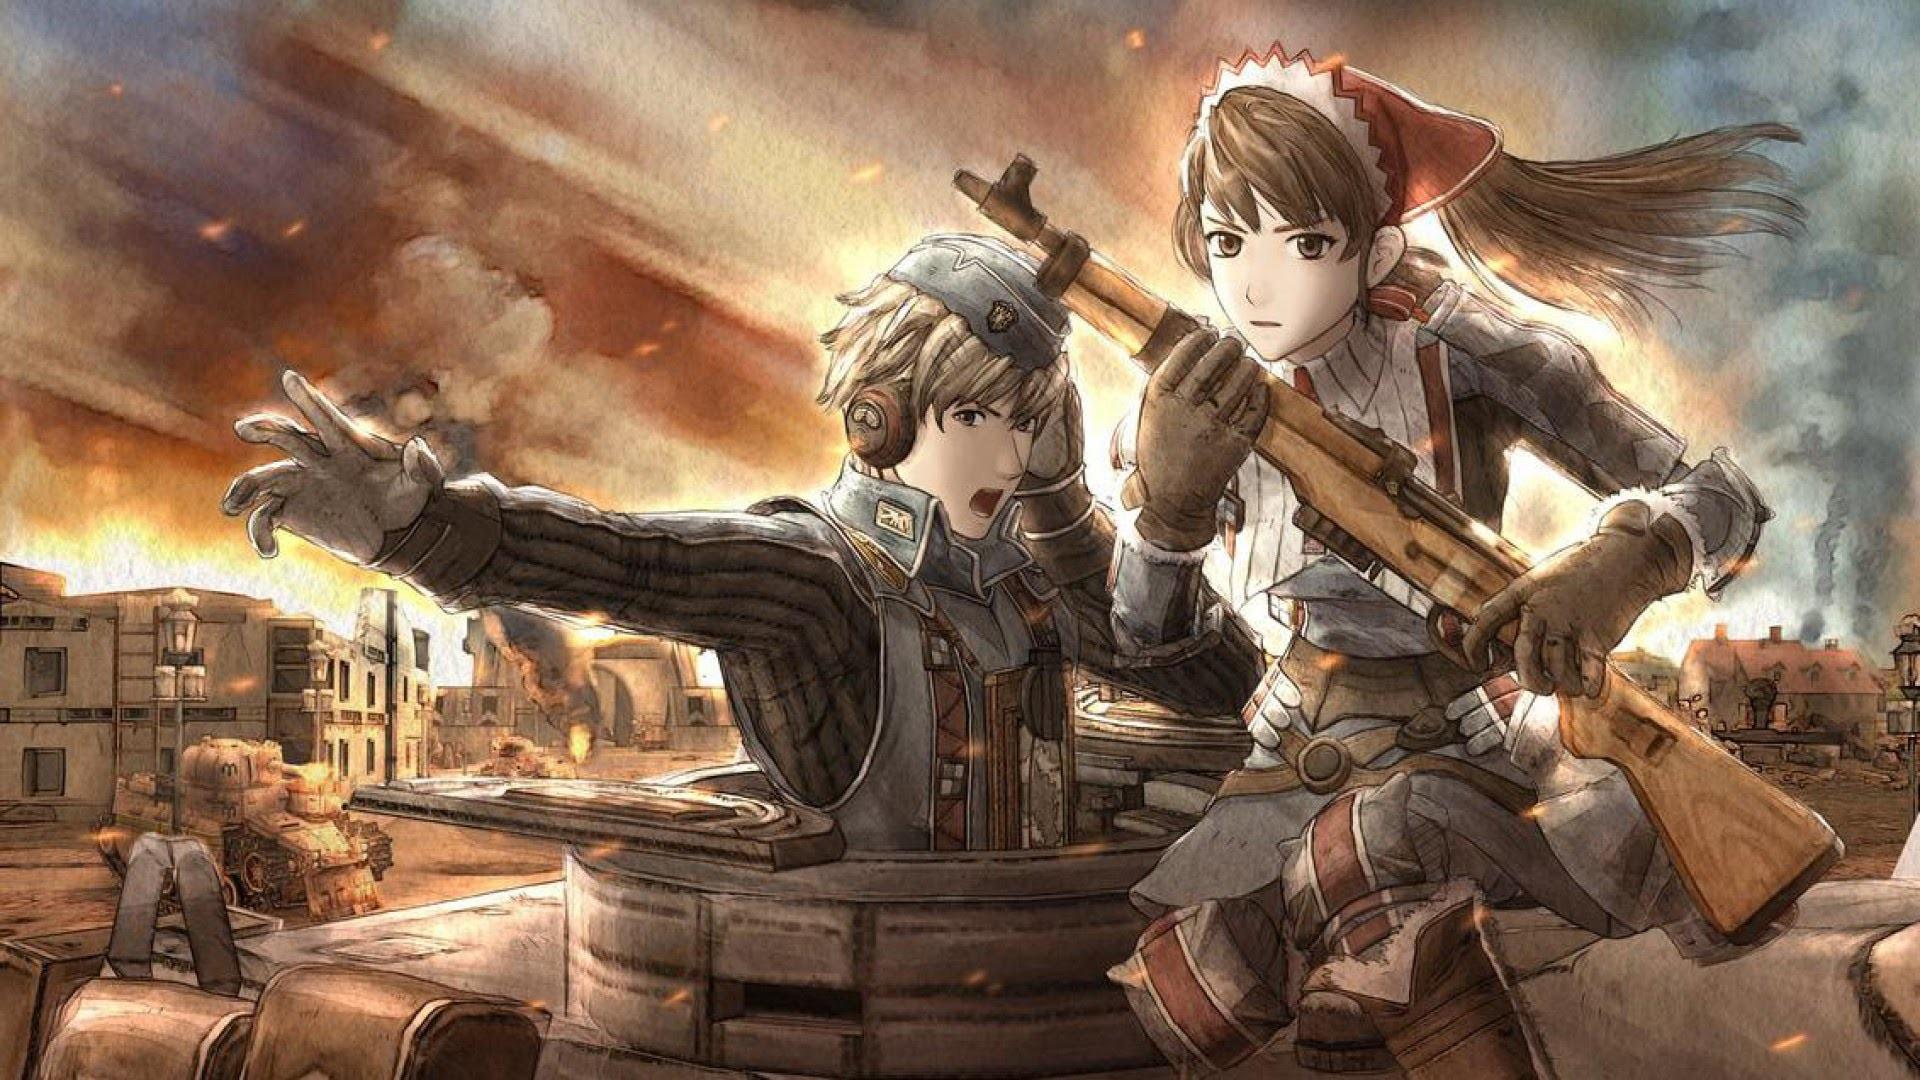 Girls Und Panzer Hd Wallpaper Valkyria Chronicles Wallpaper 183 ① Download Free Cool